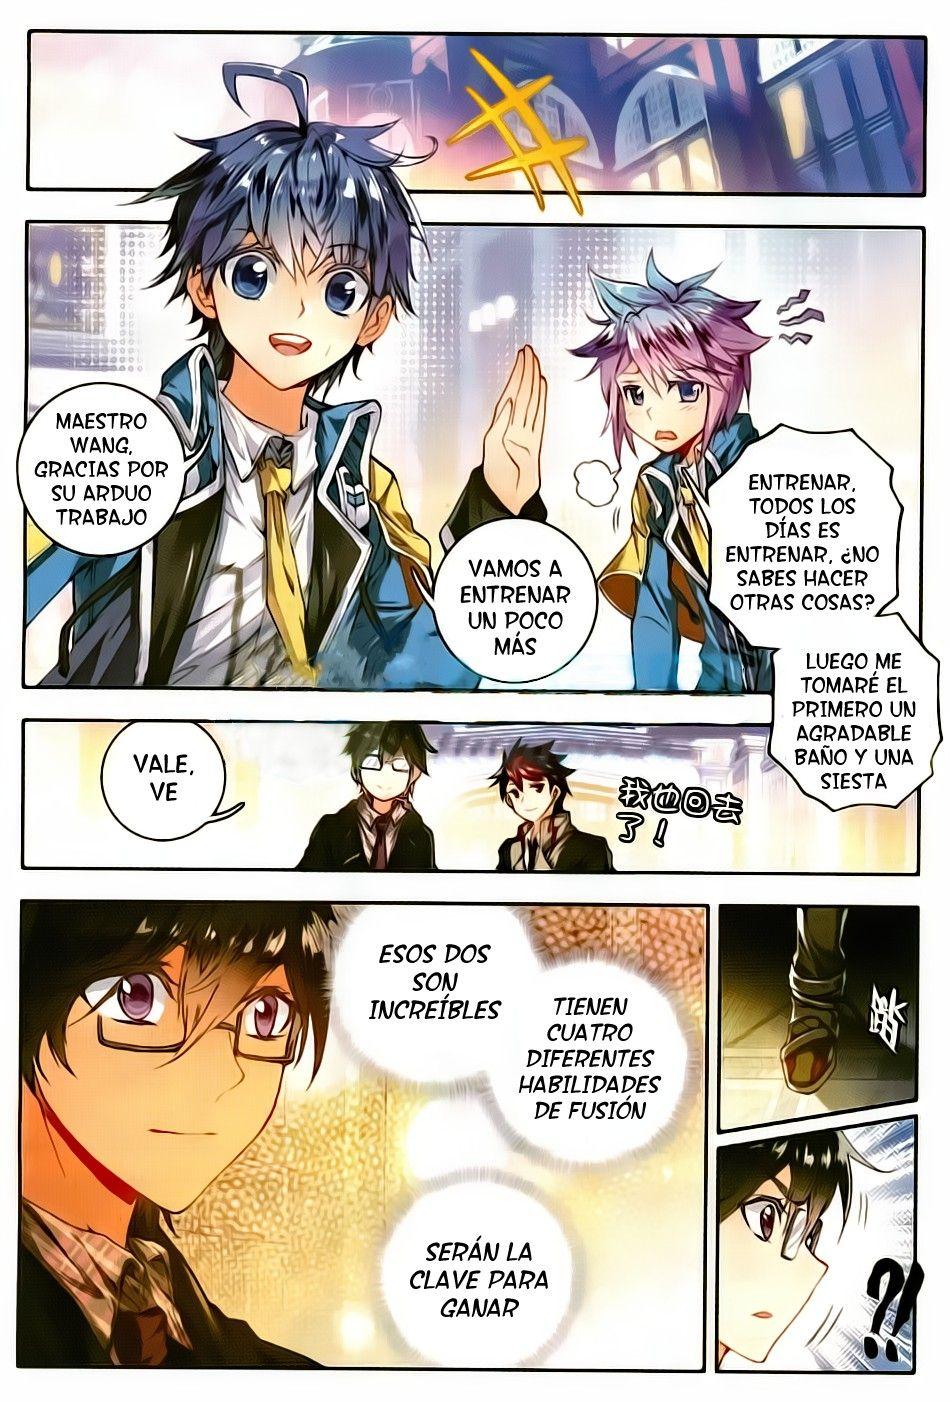 https://c5.ninemanga.com/es_manga/pic2/33/16417/513258/46ee5b0bf6c6c26a155a09dee995d97d.jpg Page 2